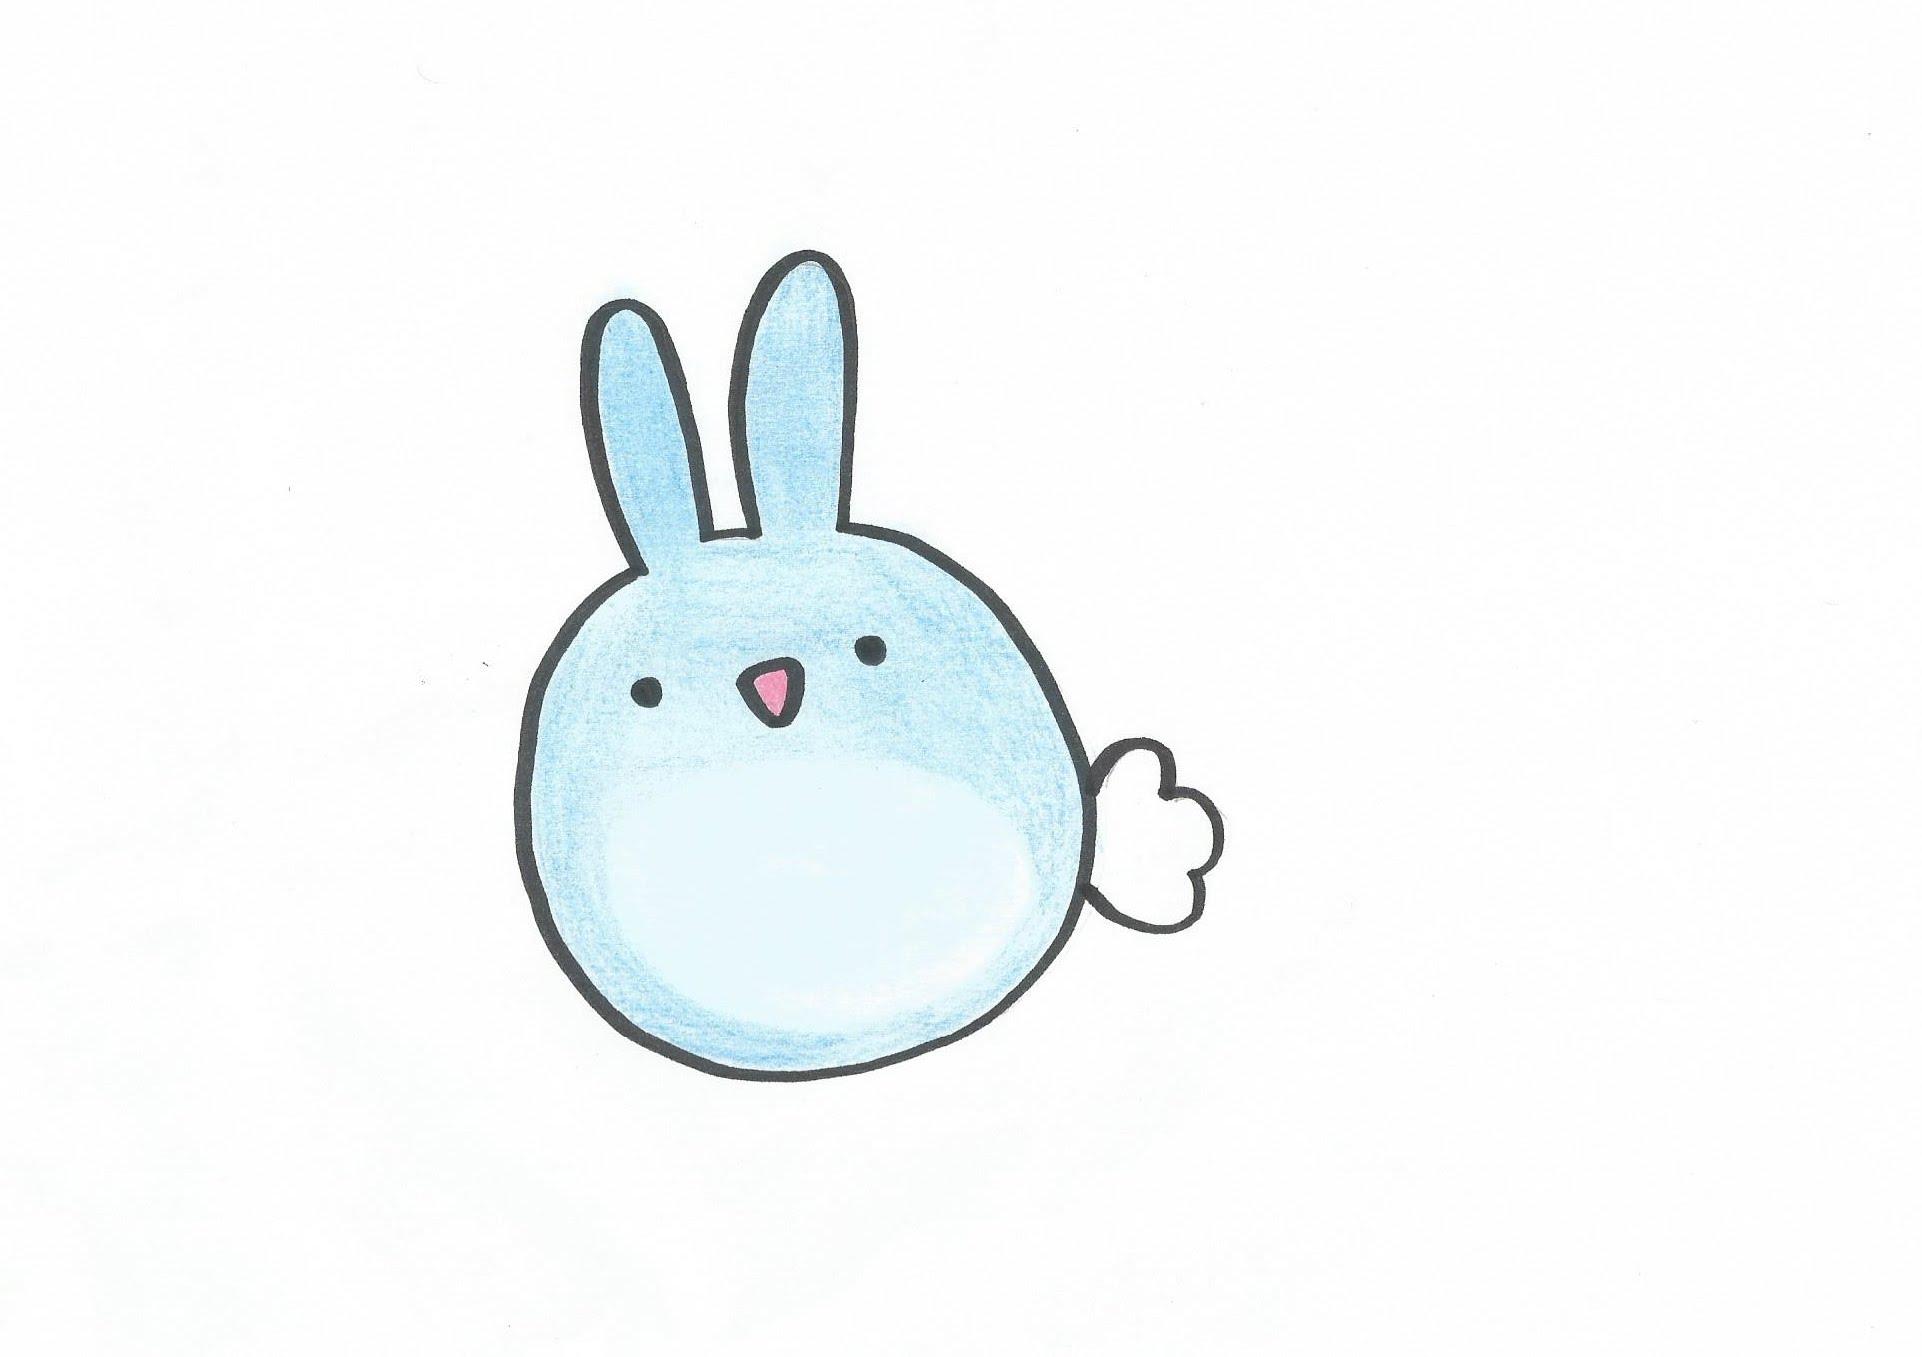 1922x1357 Cute Bunny Drawings How To Draw A Cartoon Bunny Rabbit Easy